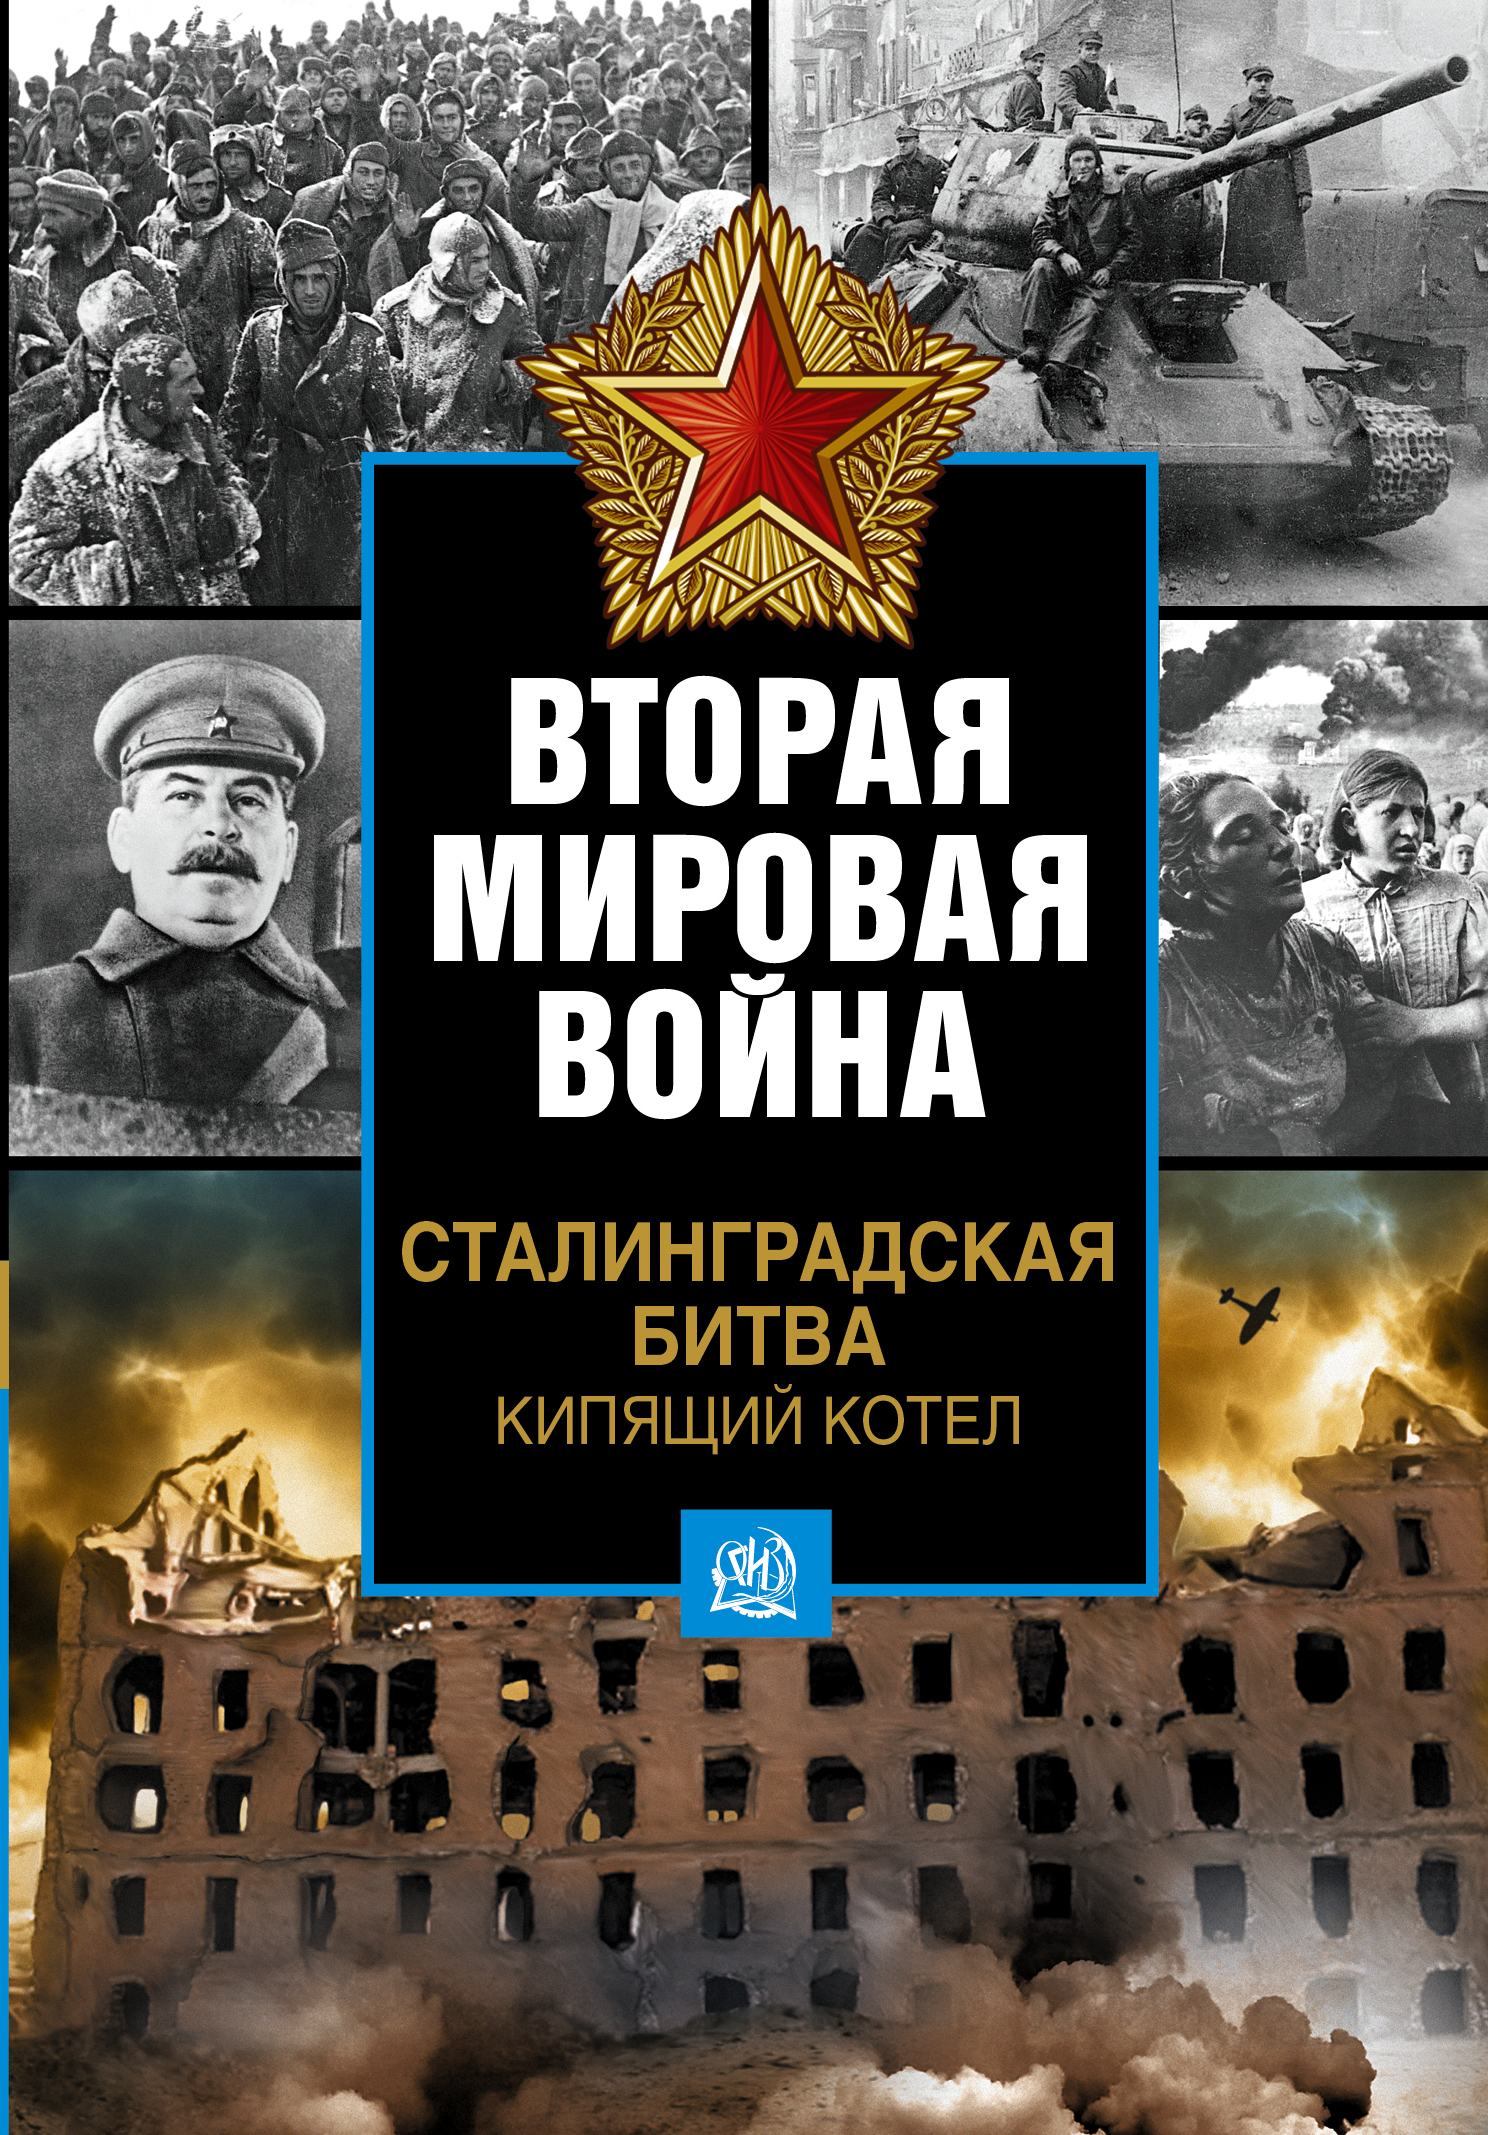 Сталинградская битва. Кипящий котел от book24.ru